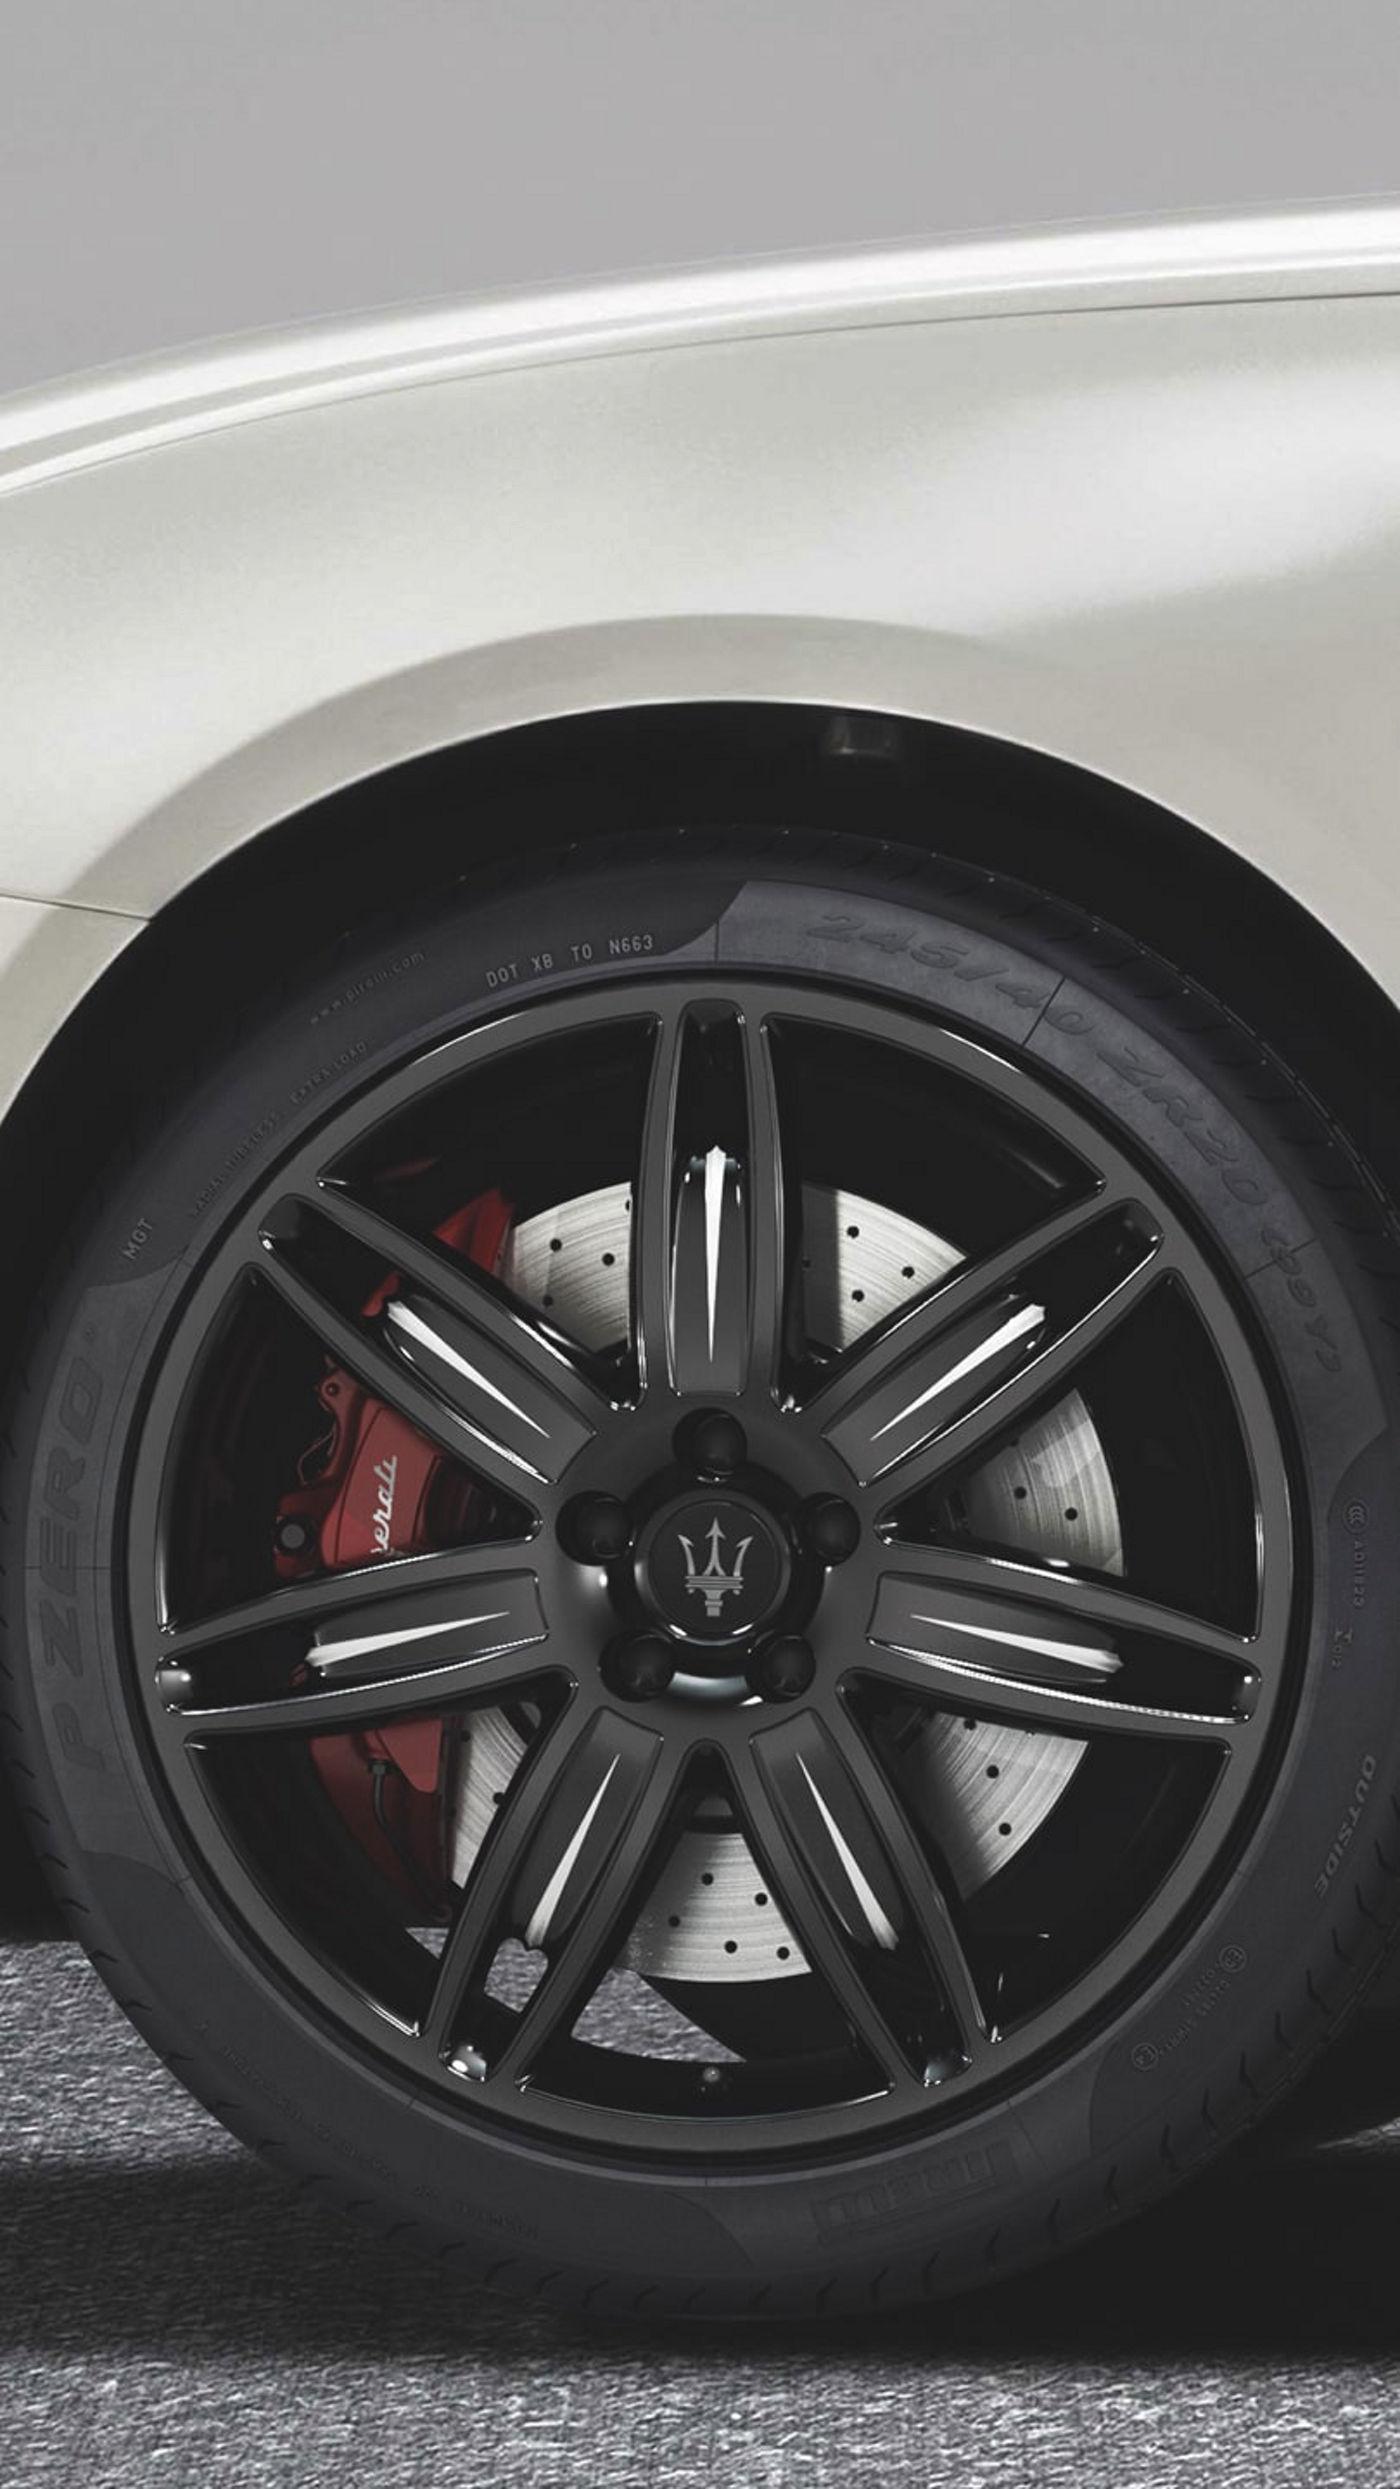 Maserati Quattroporte wheel accessories - rims and tyres